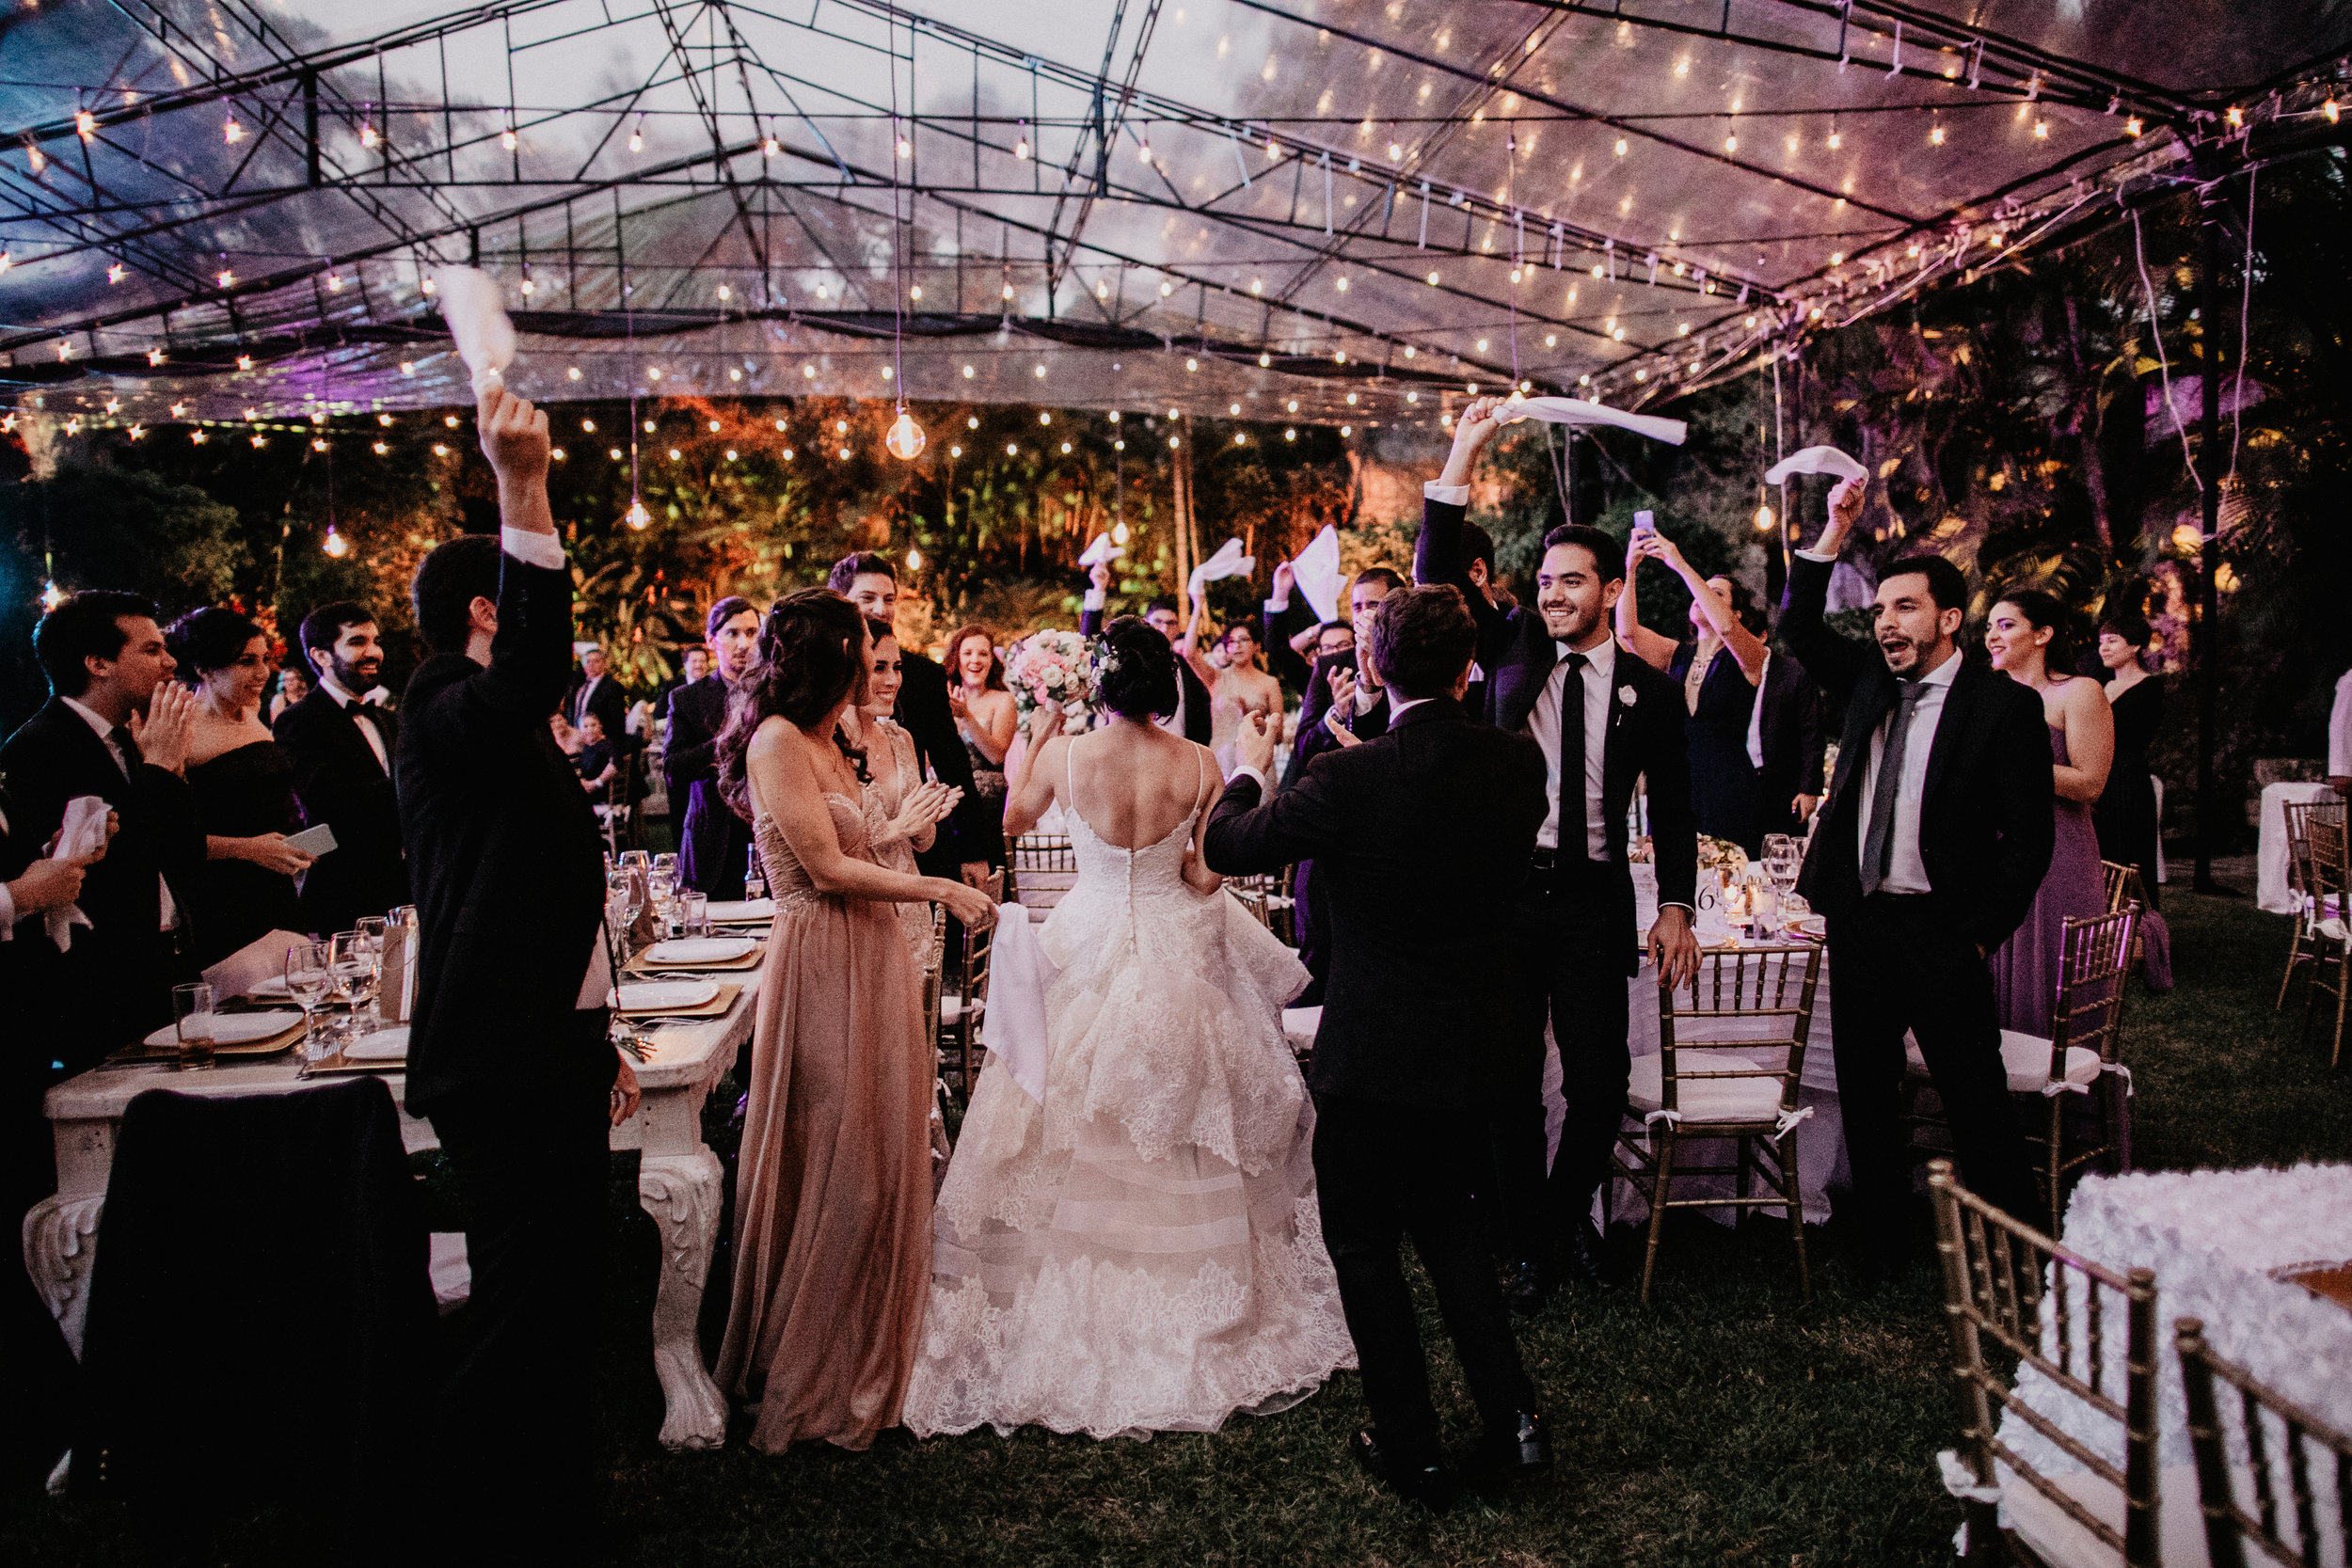 Alfonso_flores_destination_wedding_photography_vanesa_carlos-908.JPG